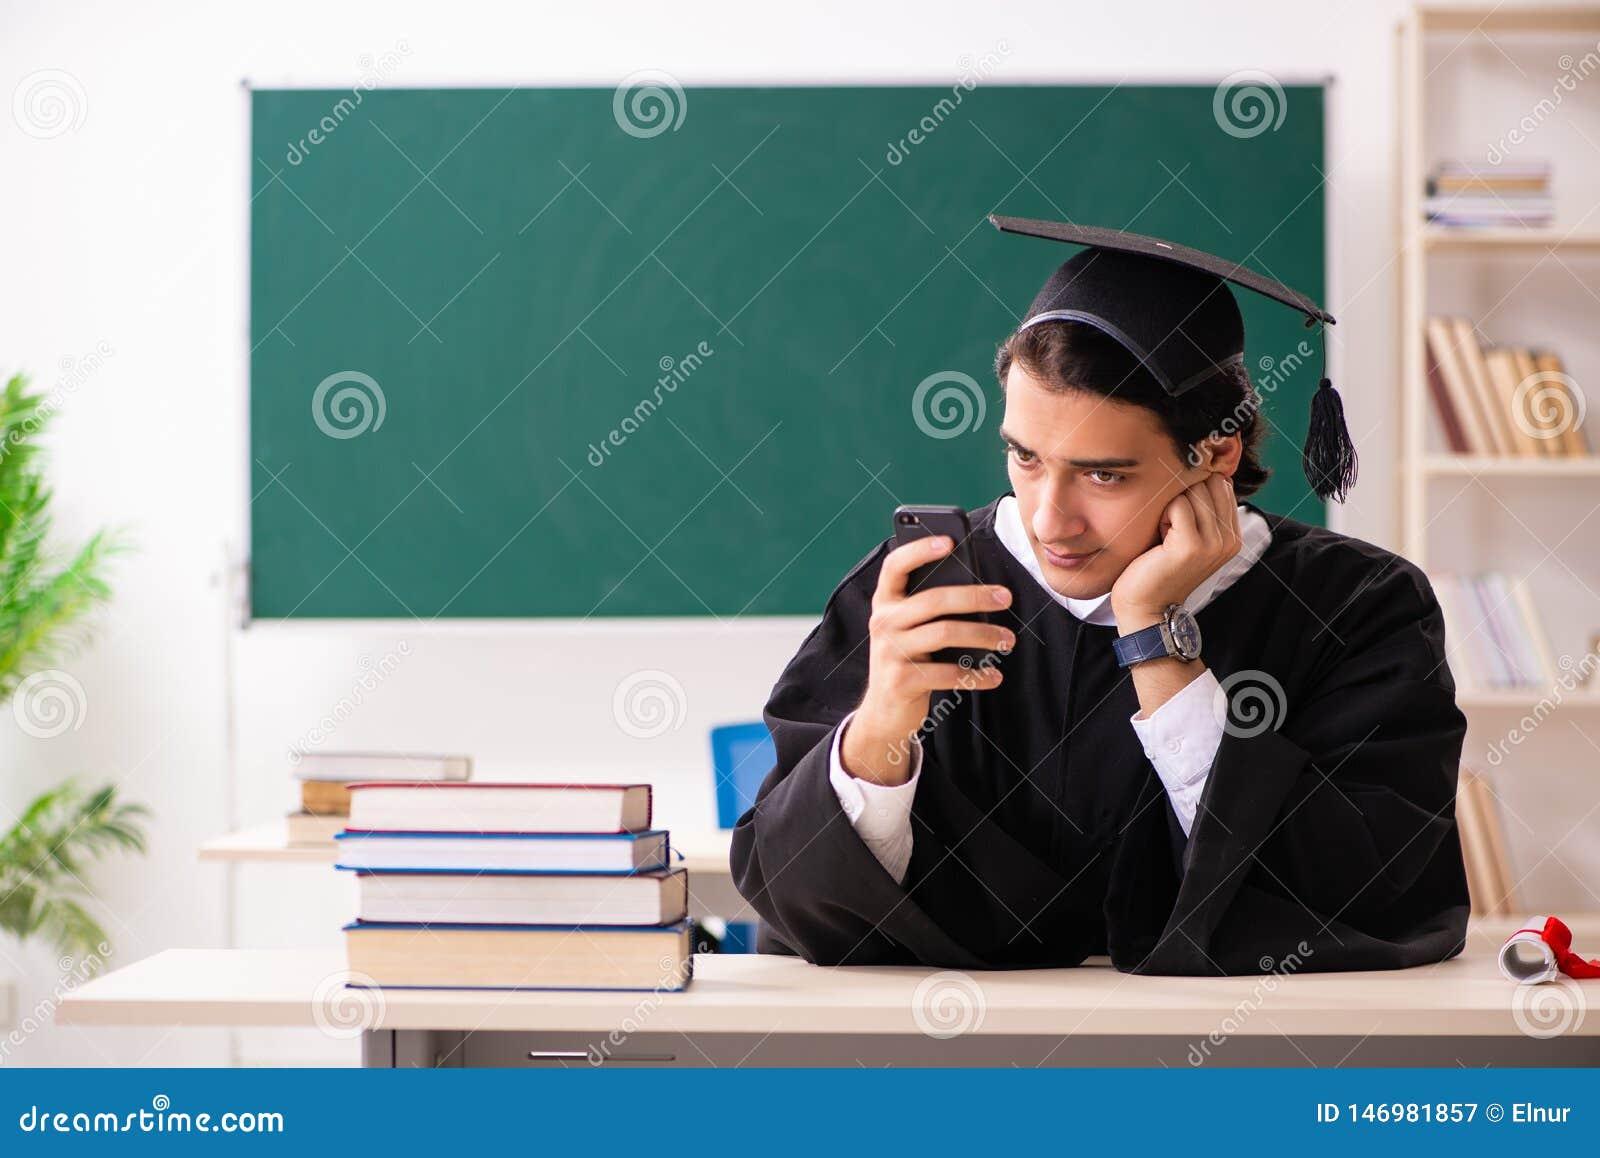 De gediplomeerde student voor groene raad